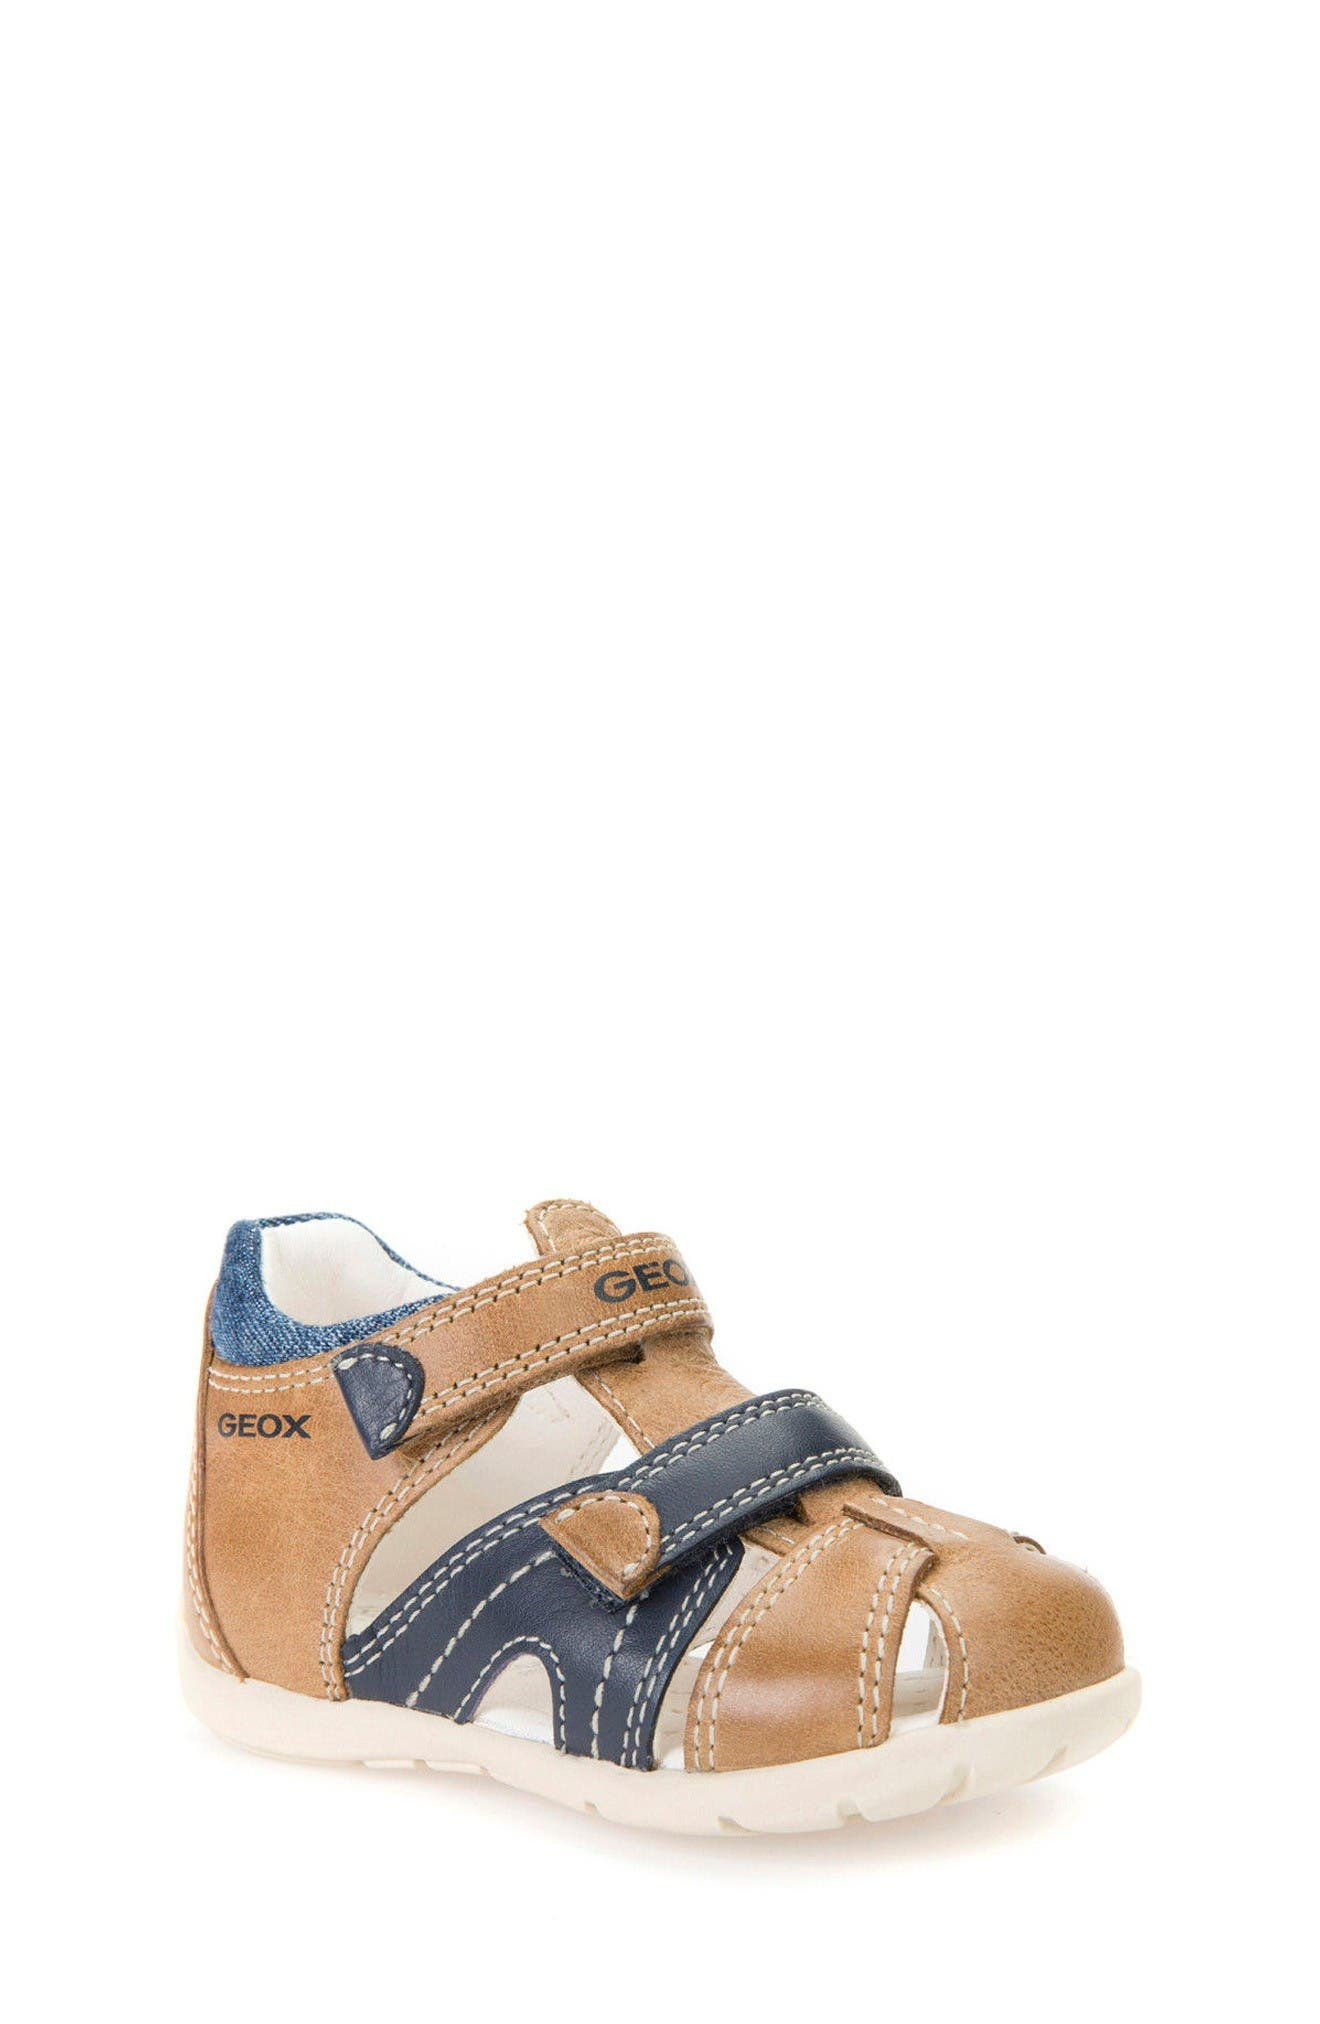 'Kaytan' Sandal,                             Main thumbnail 1, color,                             Caramel/ Navy